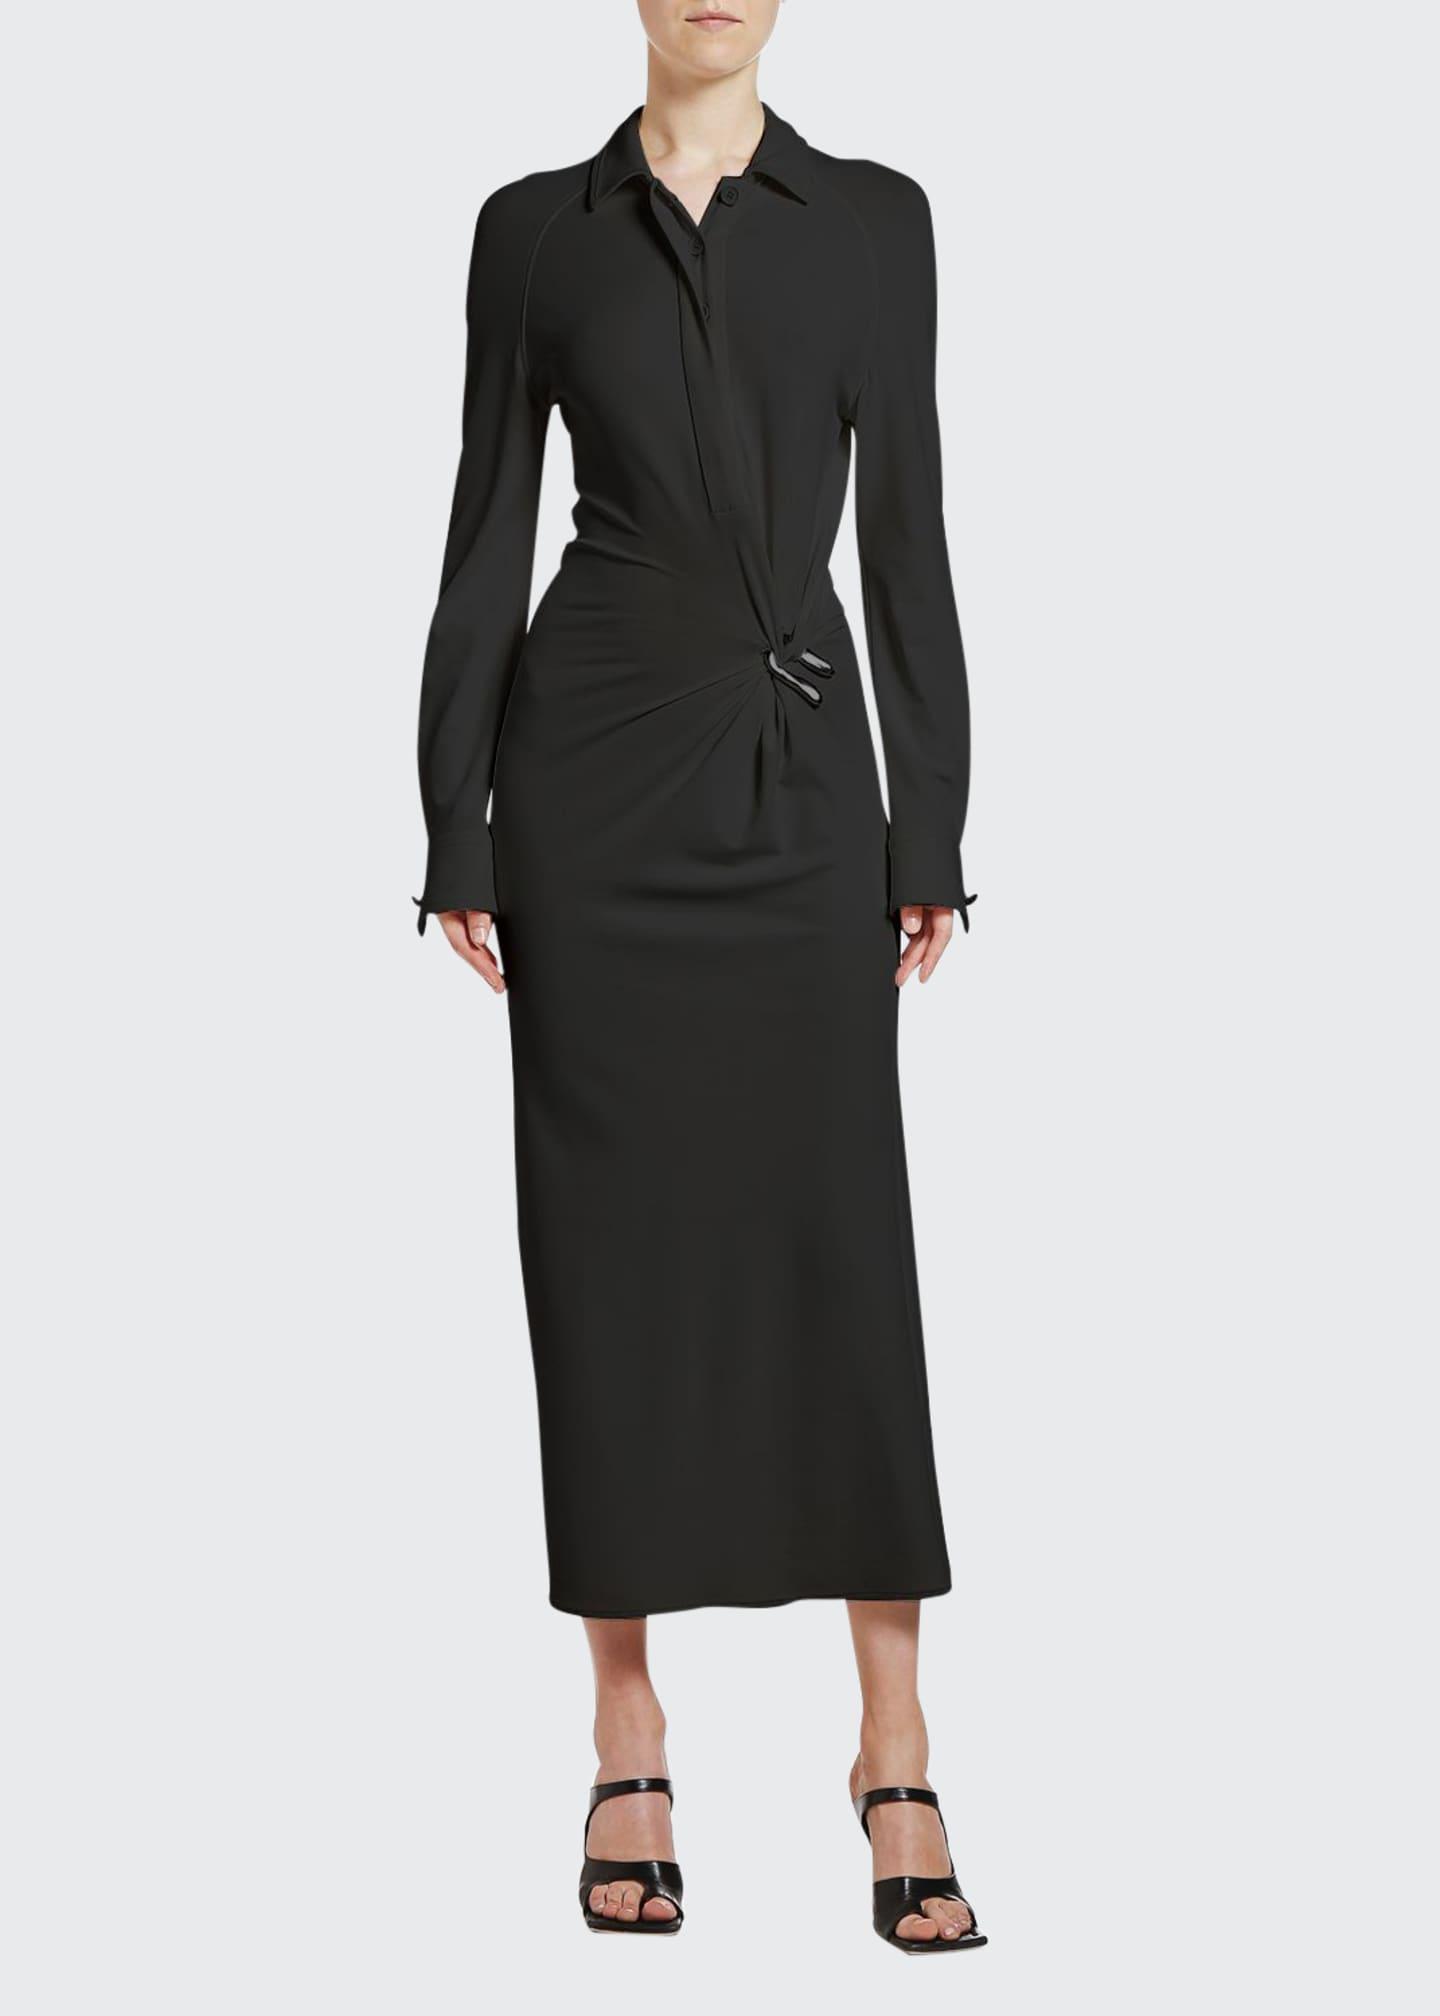 Bottega Veneta Wrapped Midi Shirtdress